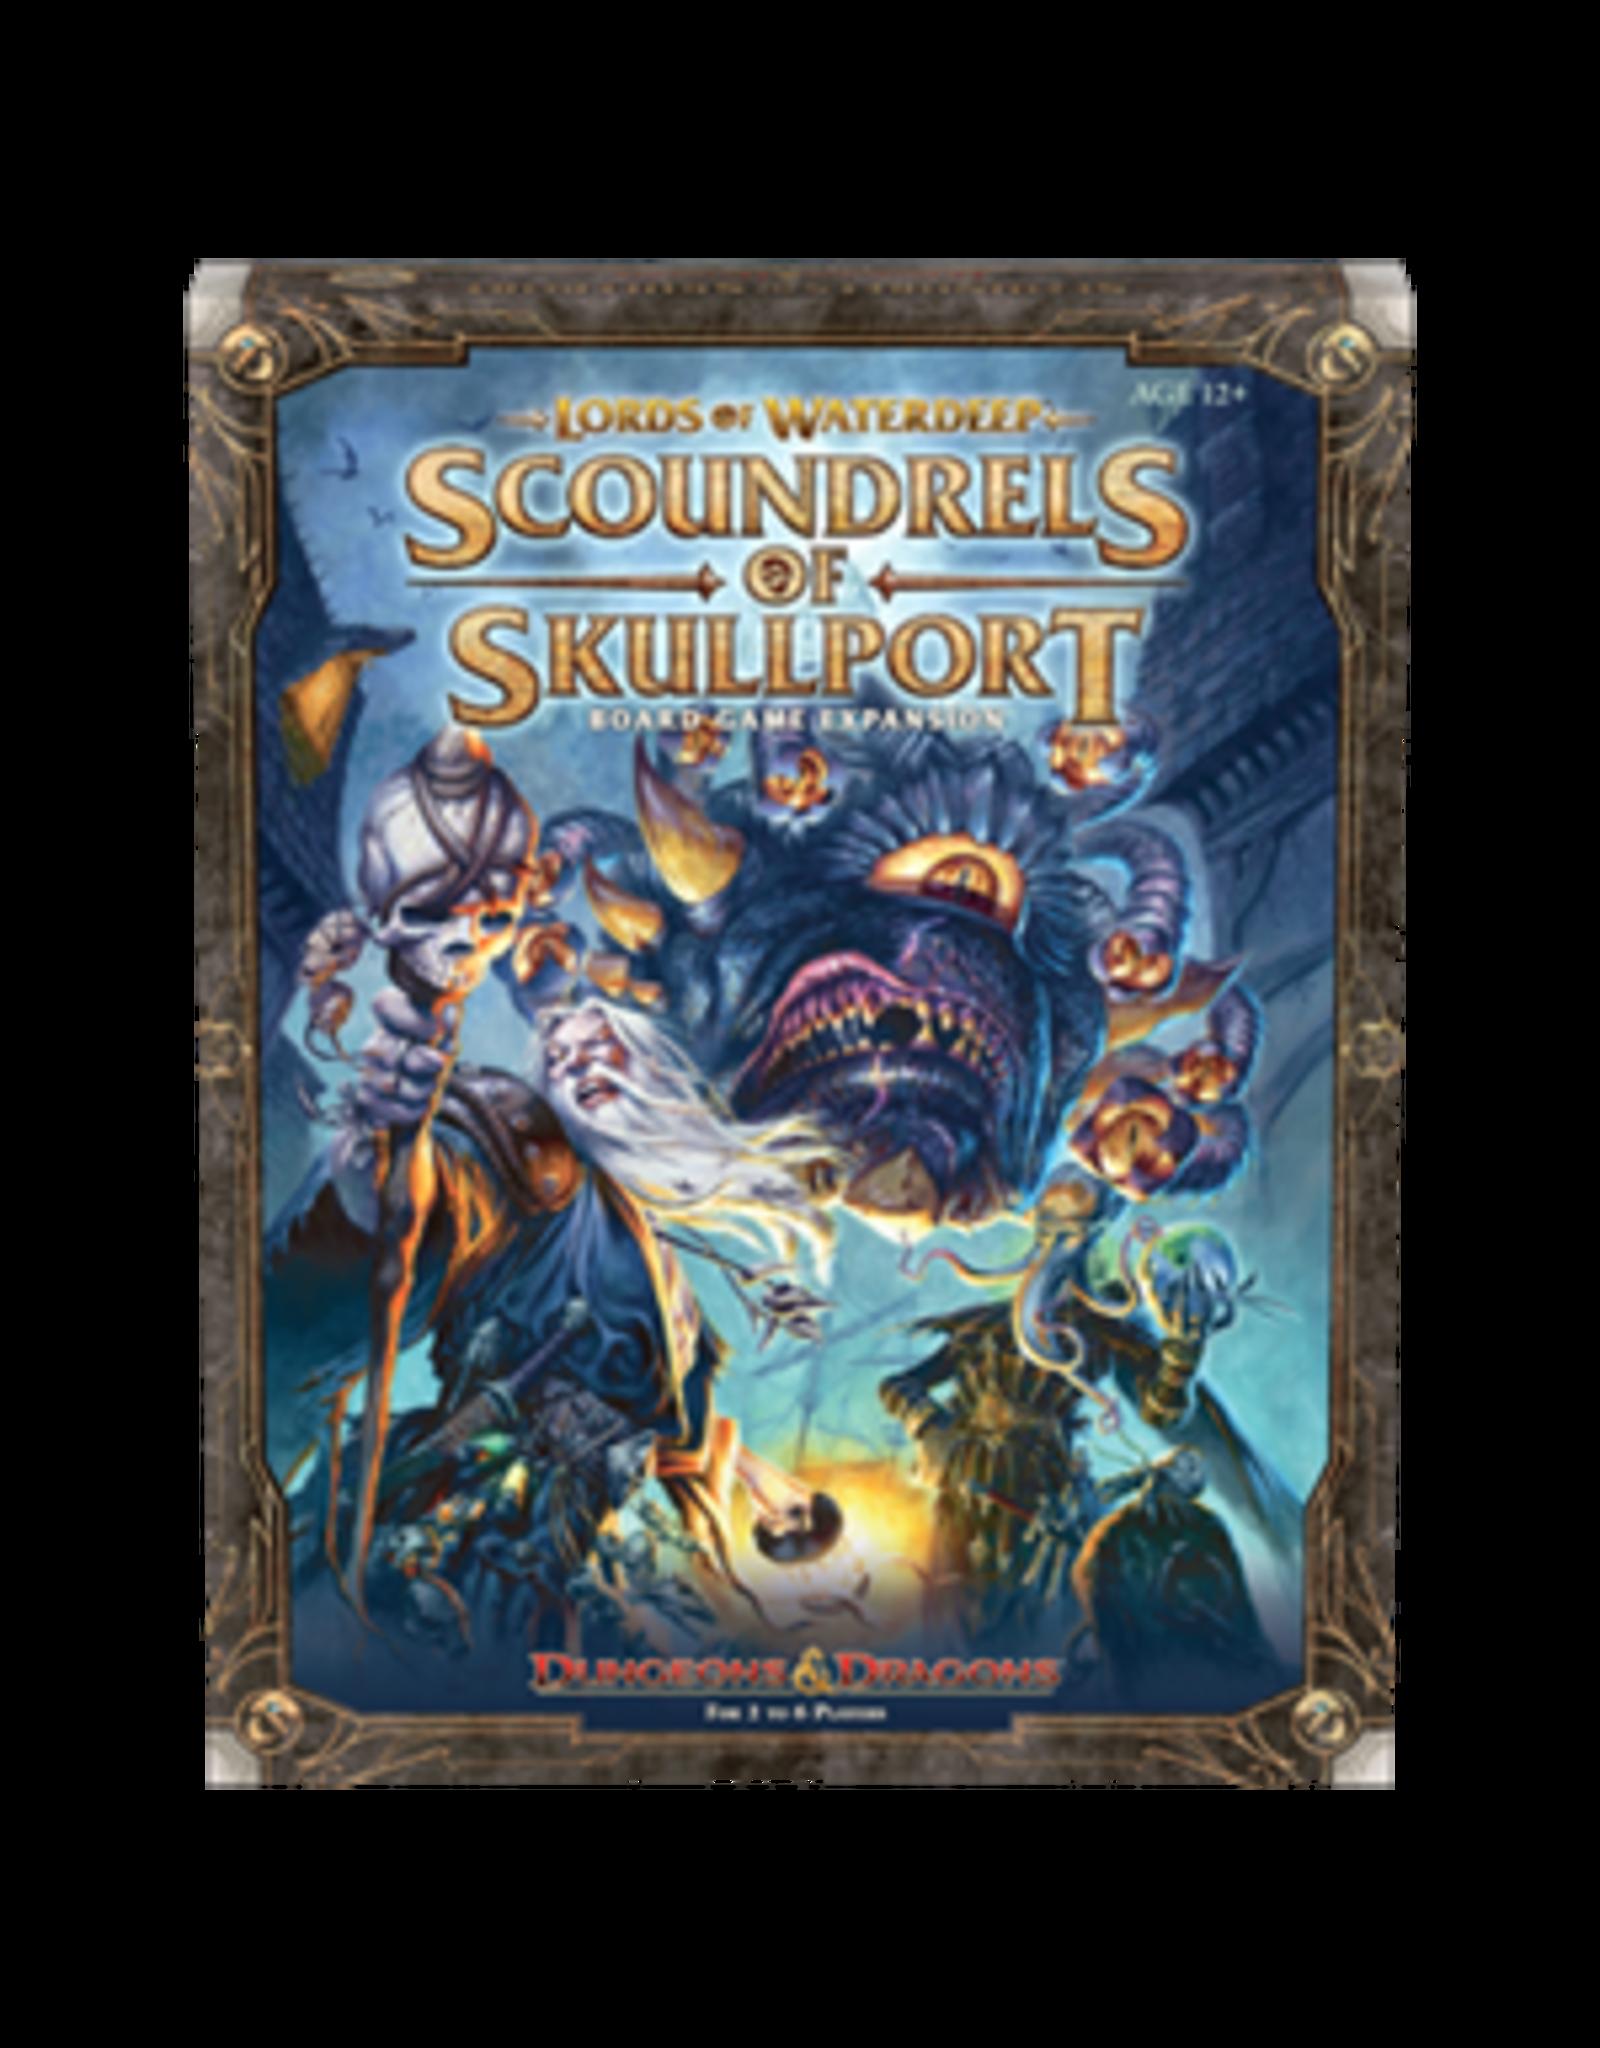 Wizards of the Coast D&D: Lords of Waterdeep Boardgame - Scoundrels of Skullport